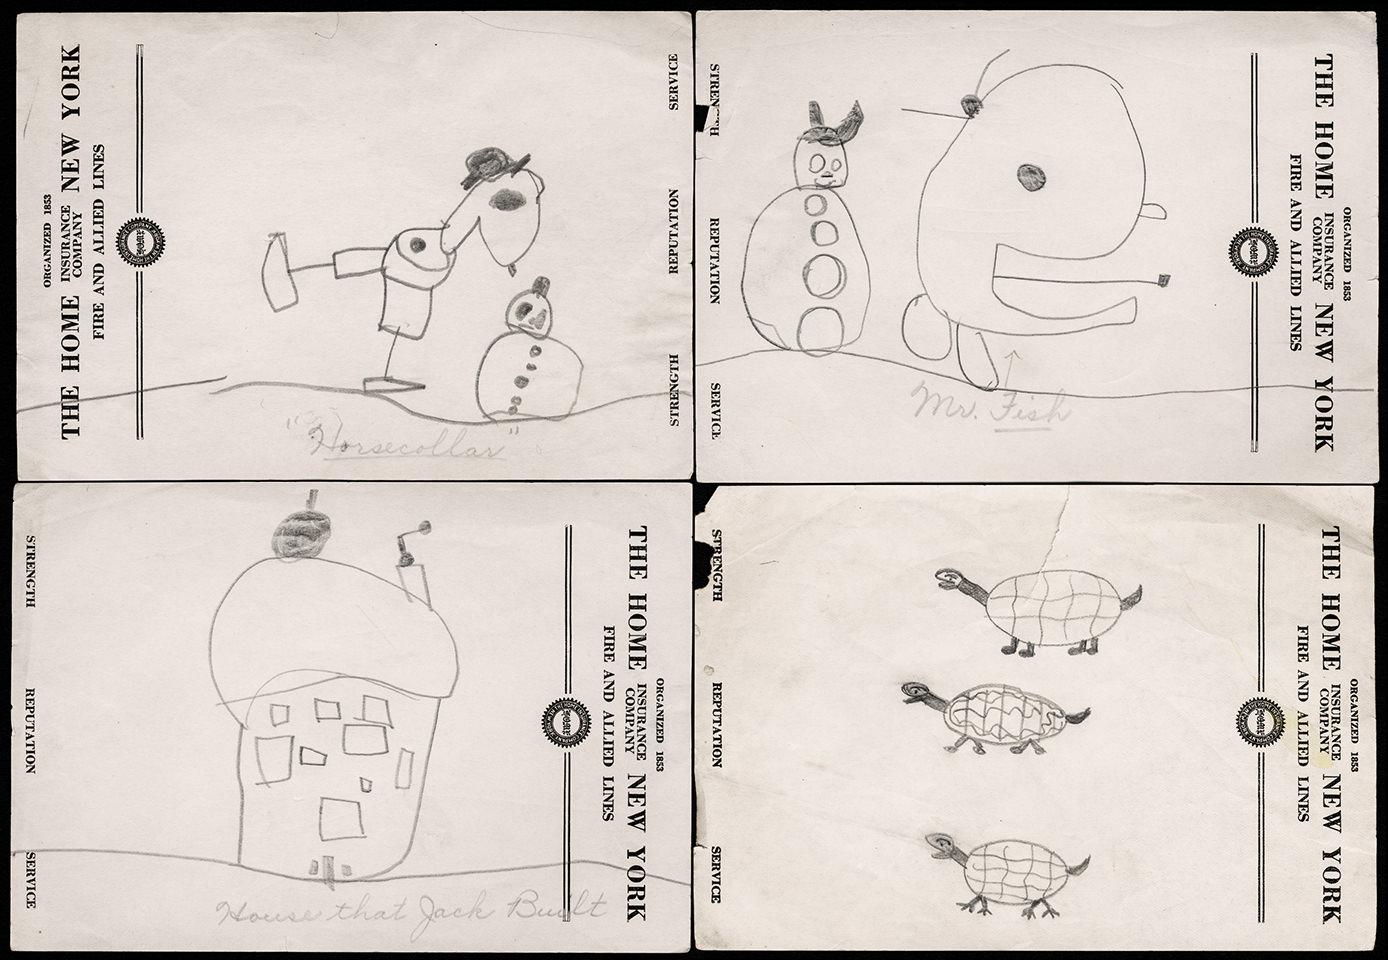 Childhood Drawings